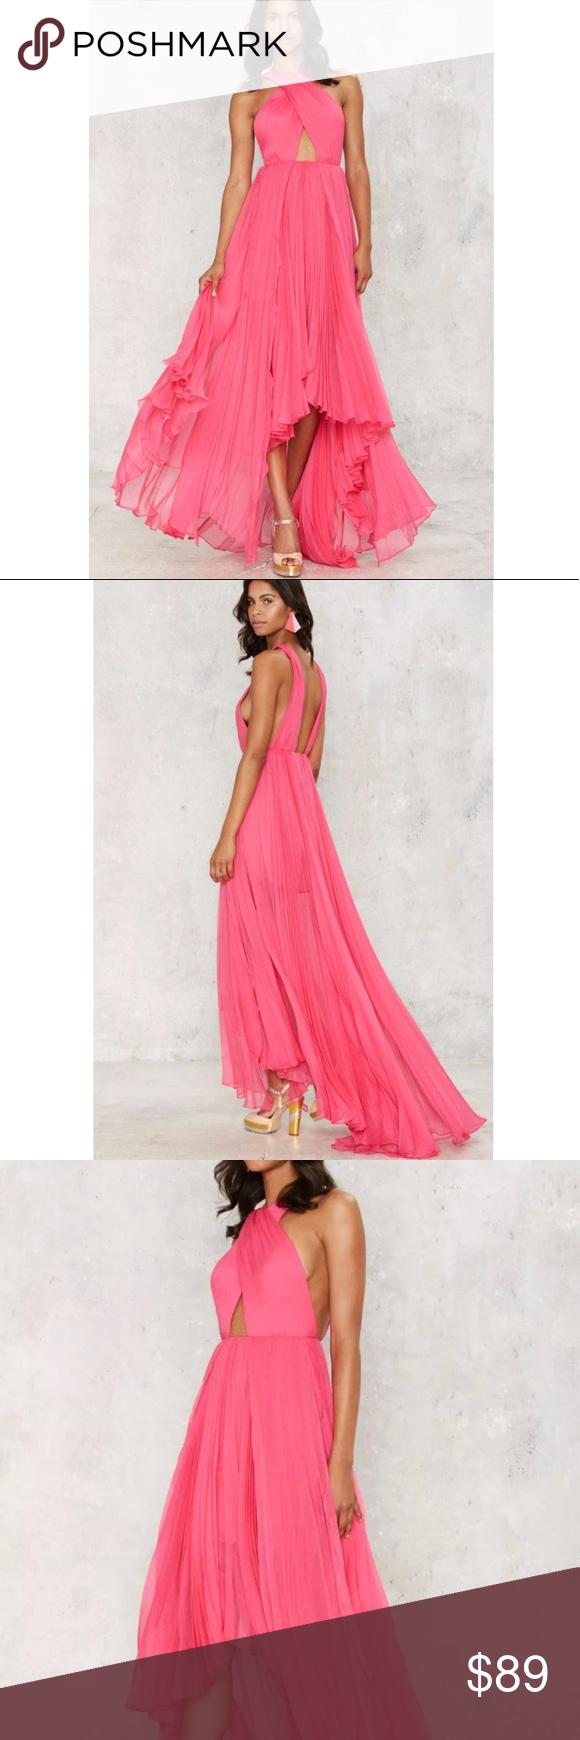 Hot pink maxi dress  Nasty Gal Hot Pink Maxi Dress Boutique  My Posh Picks  Pinterest